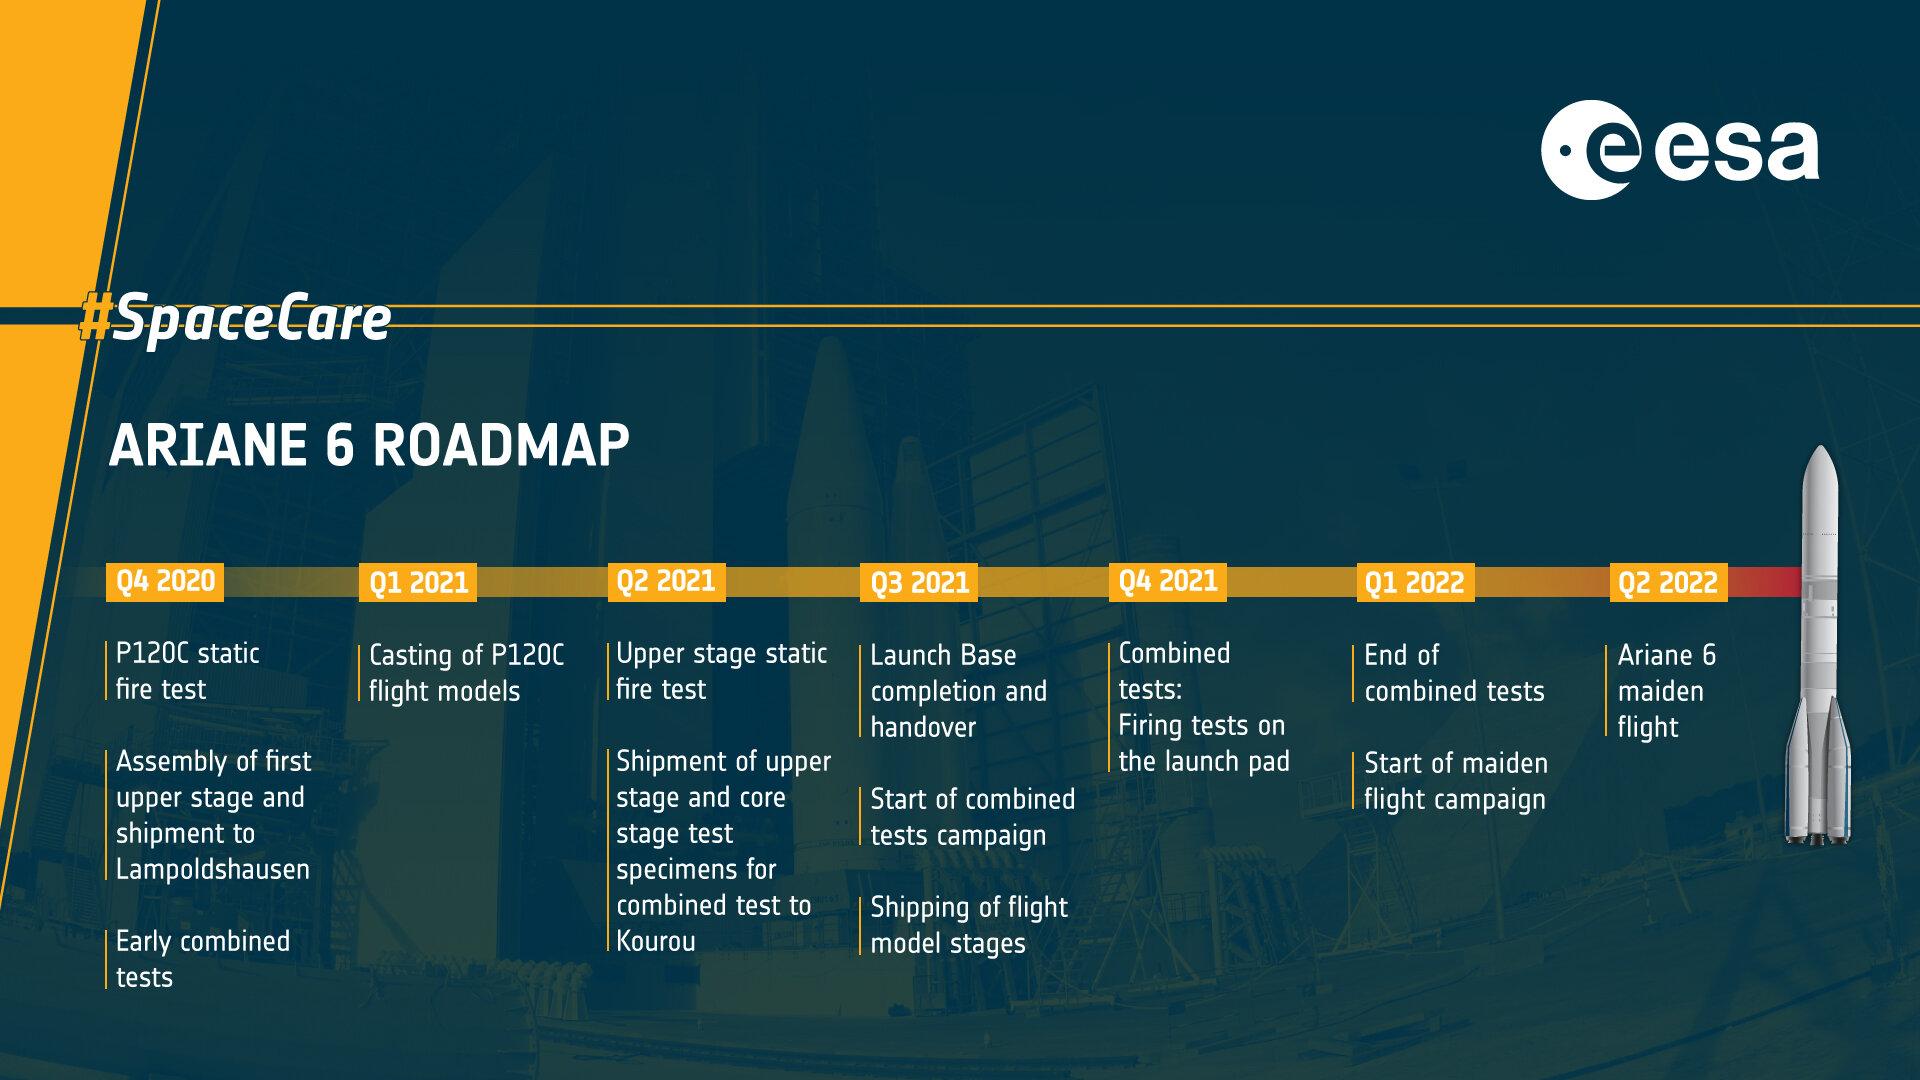 Ariane 6  - Le nouveau lanceur (3/3) - Page 16 ElvDwDhXIAAl_Zd?format=jpg&name=large